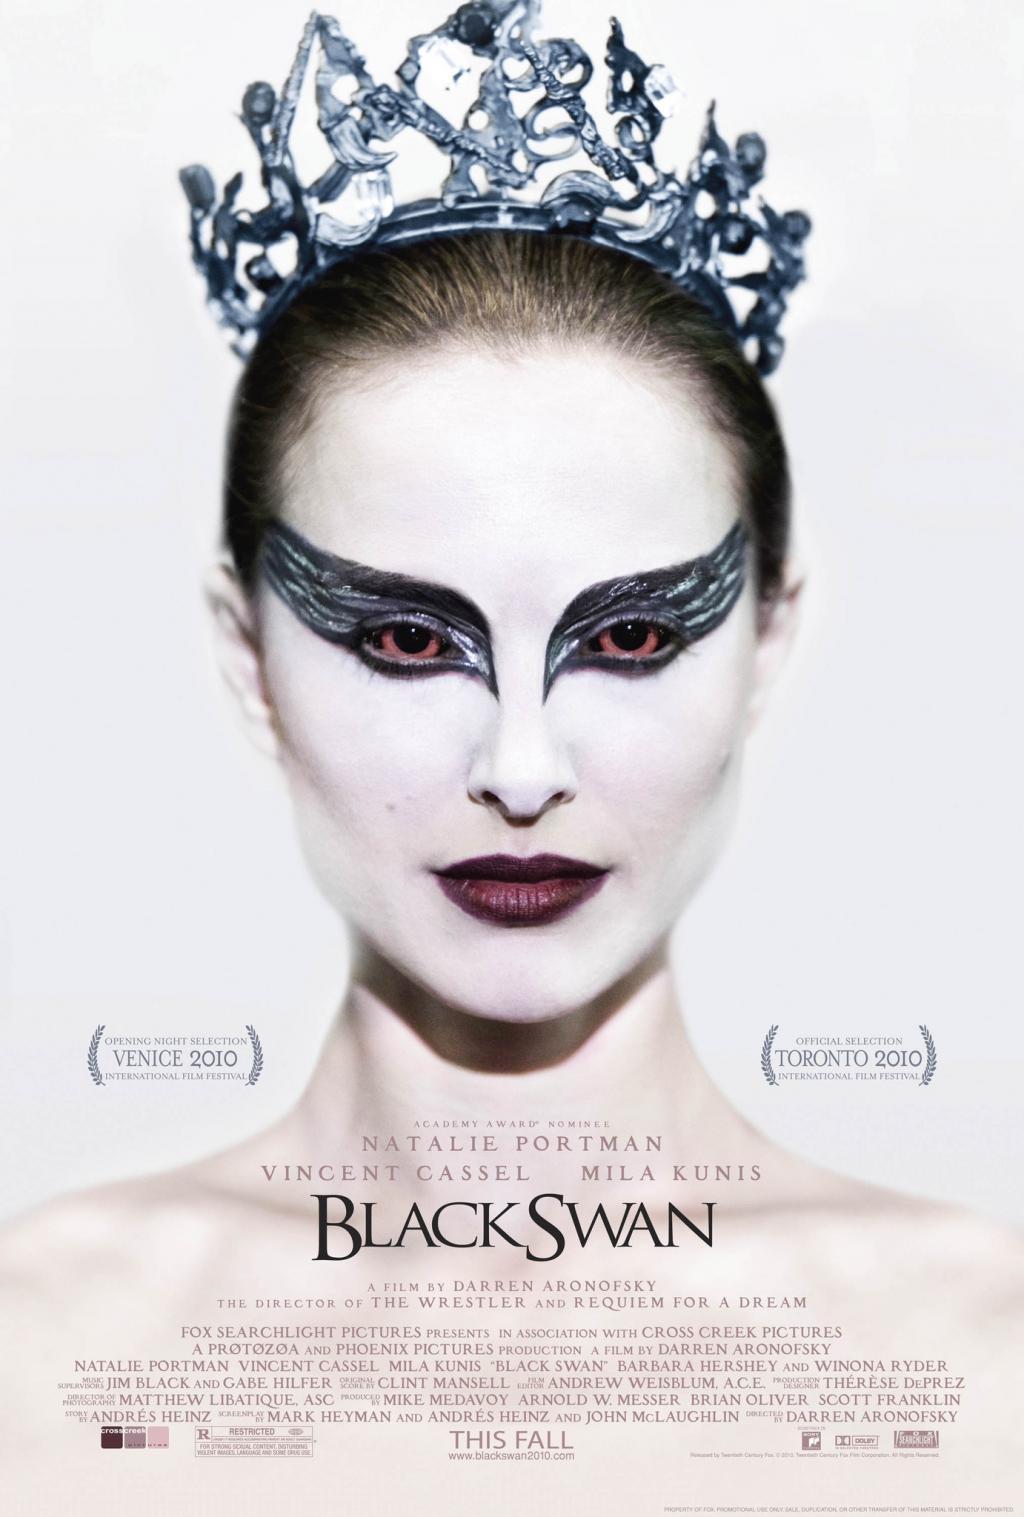 فیلم ترسناک قوی سیاه